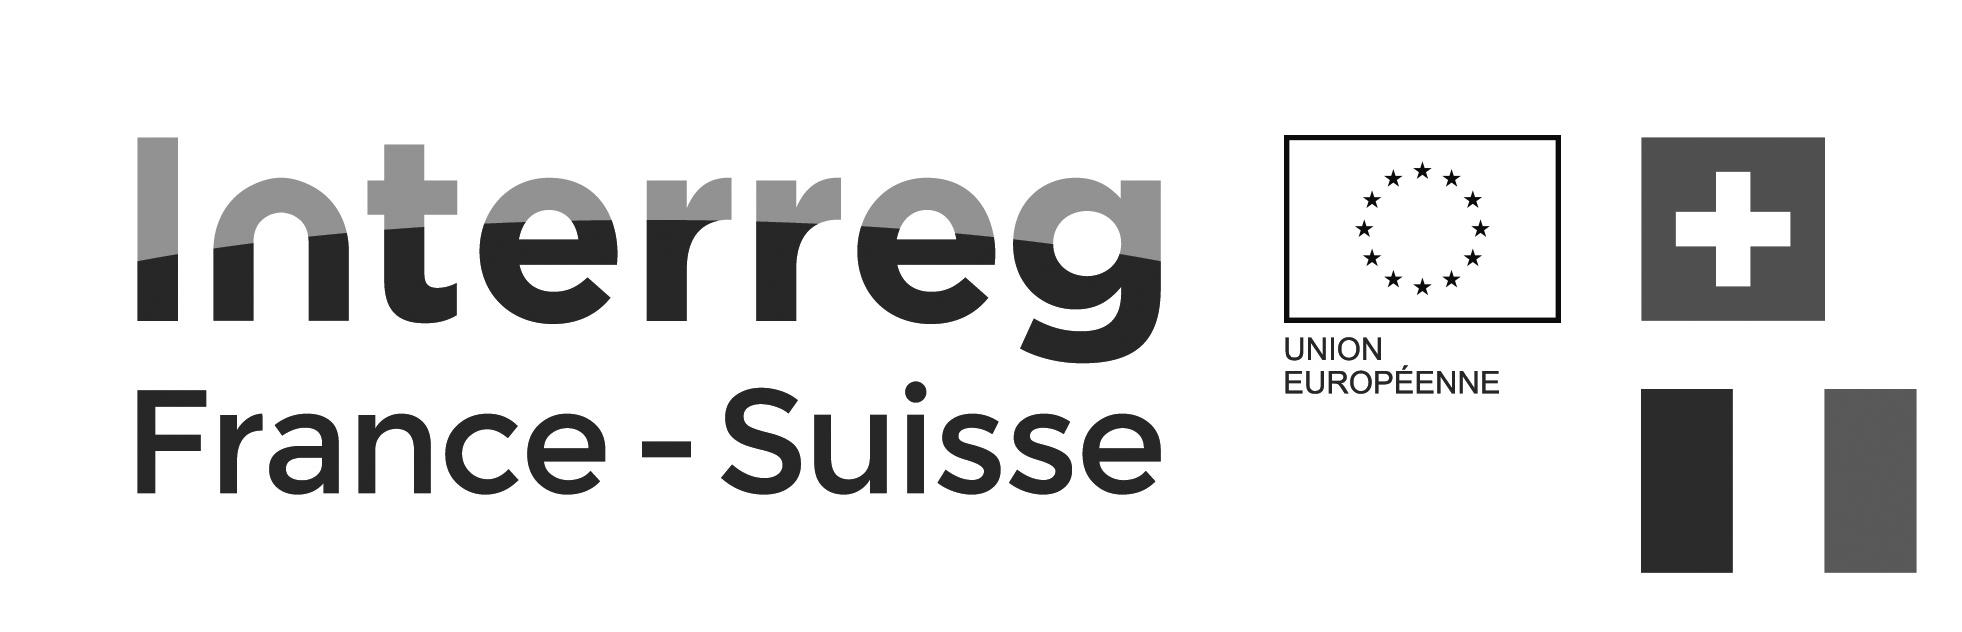 interreg_france_suisse_gris